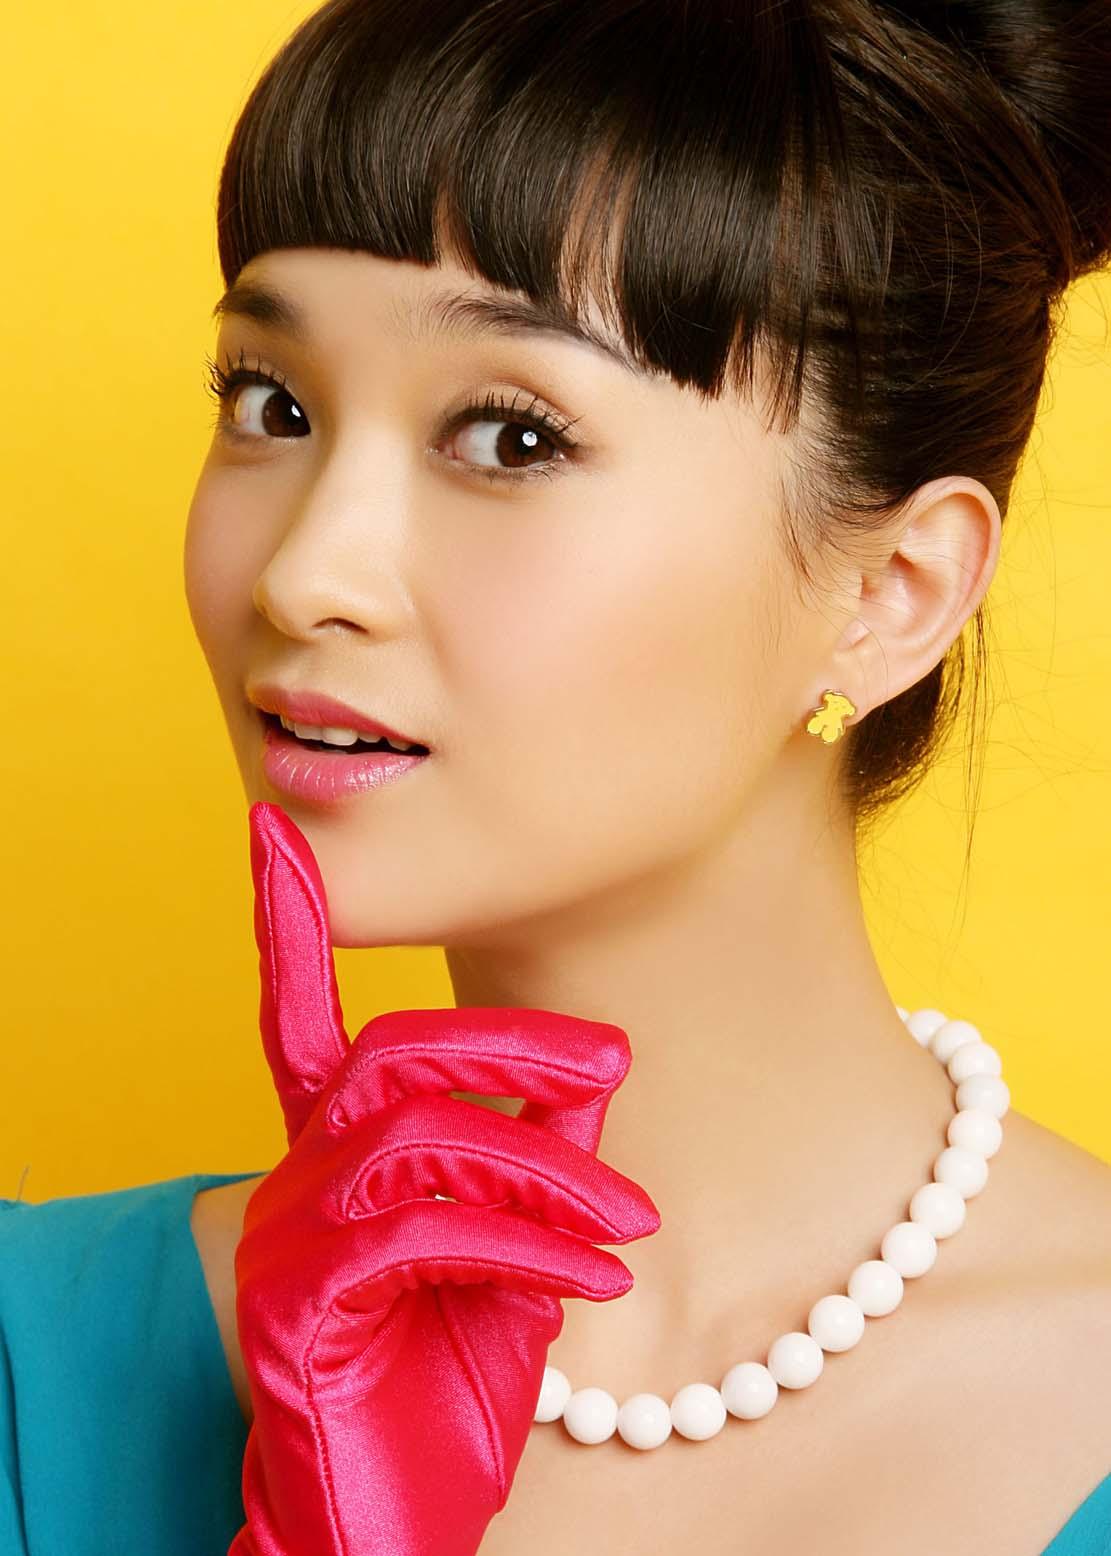 Asian Actresses Beautiful Chinese Hot Girls Hd Wallpapers-7665